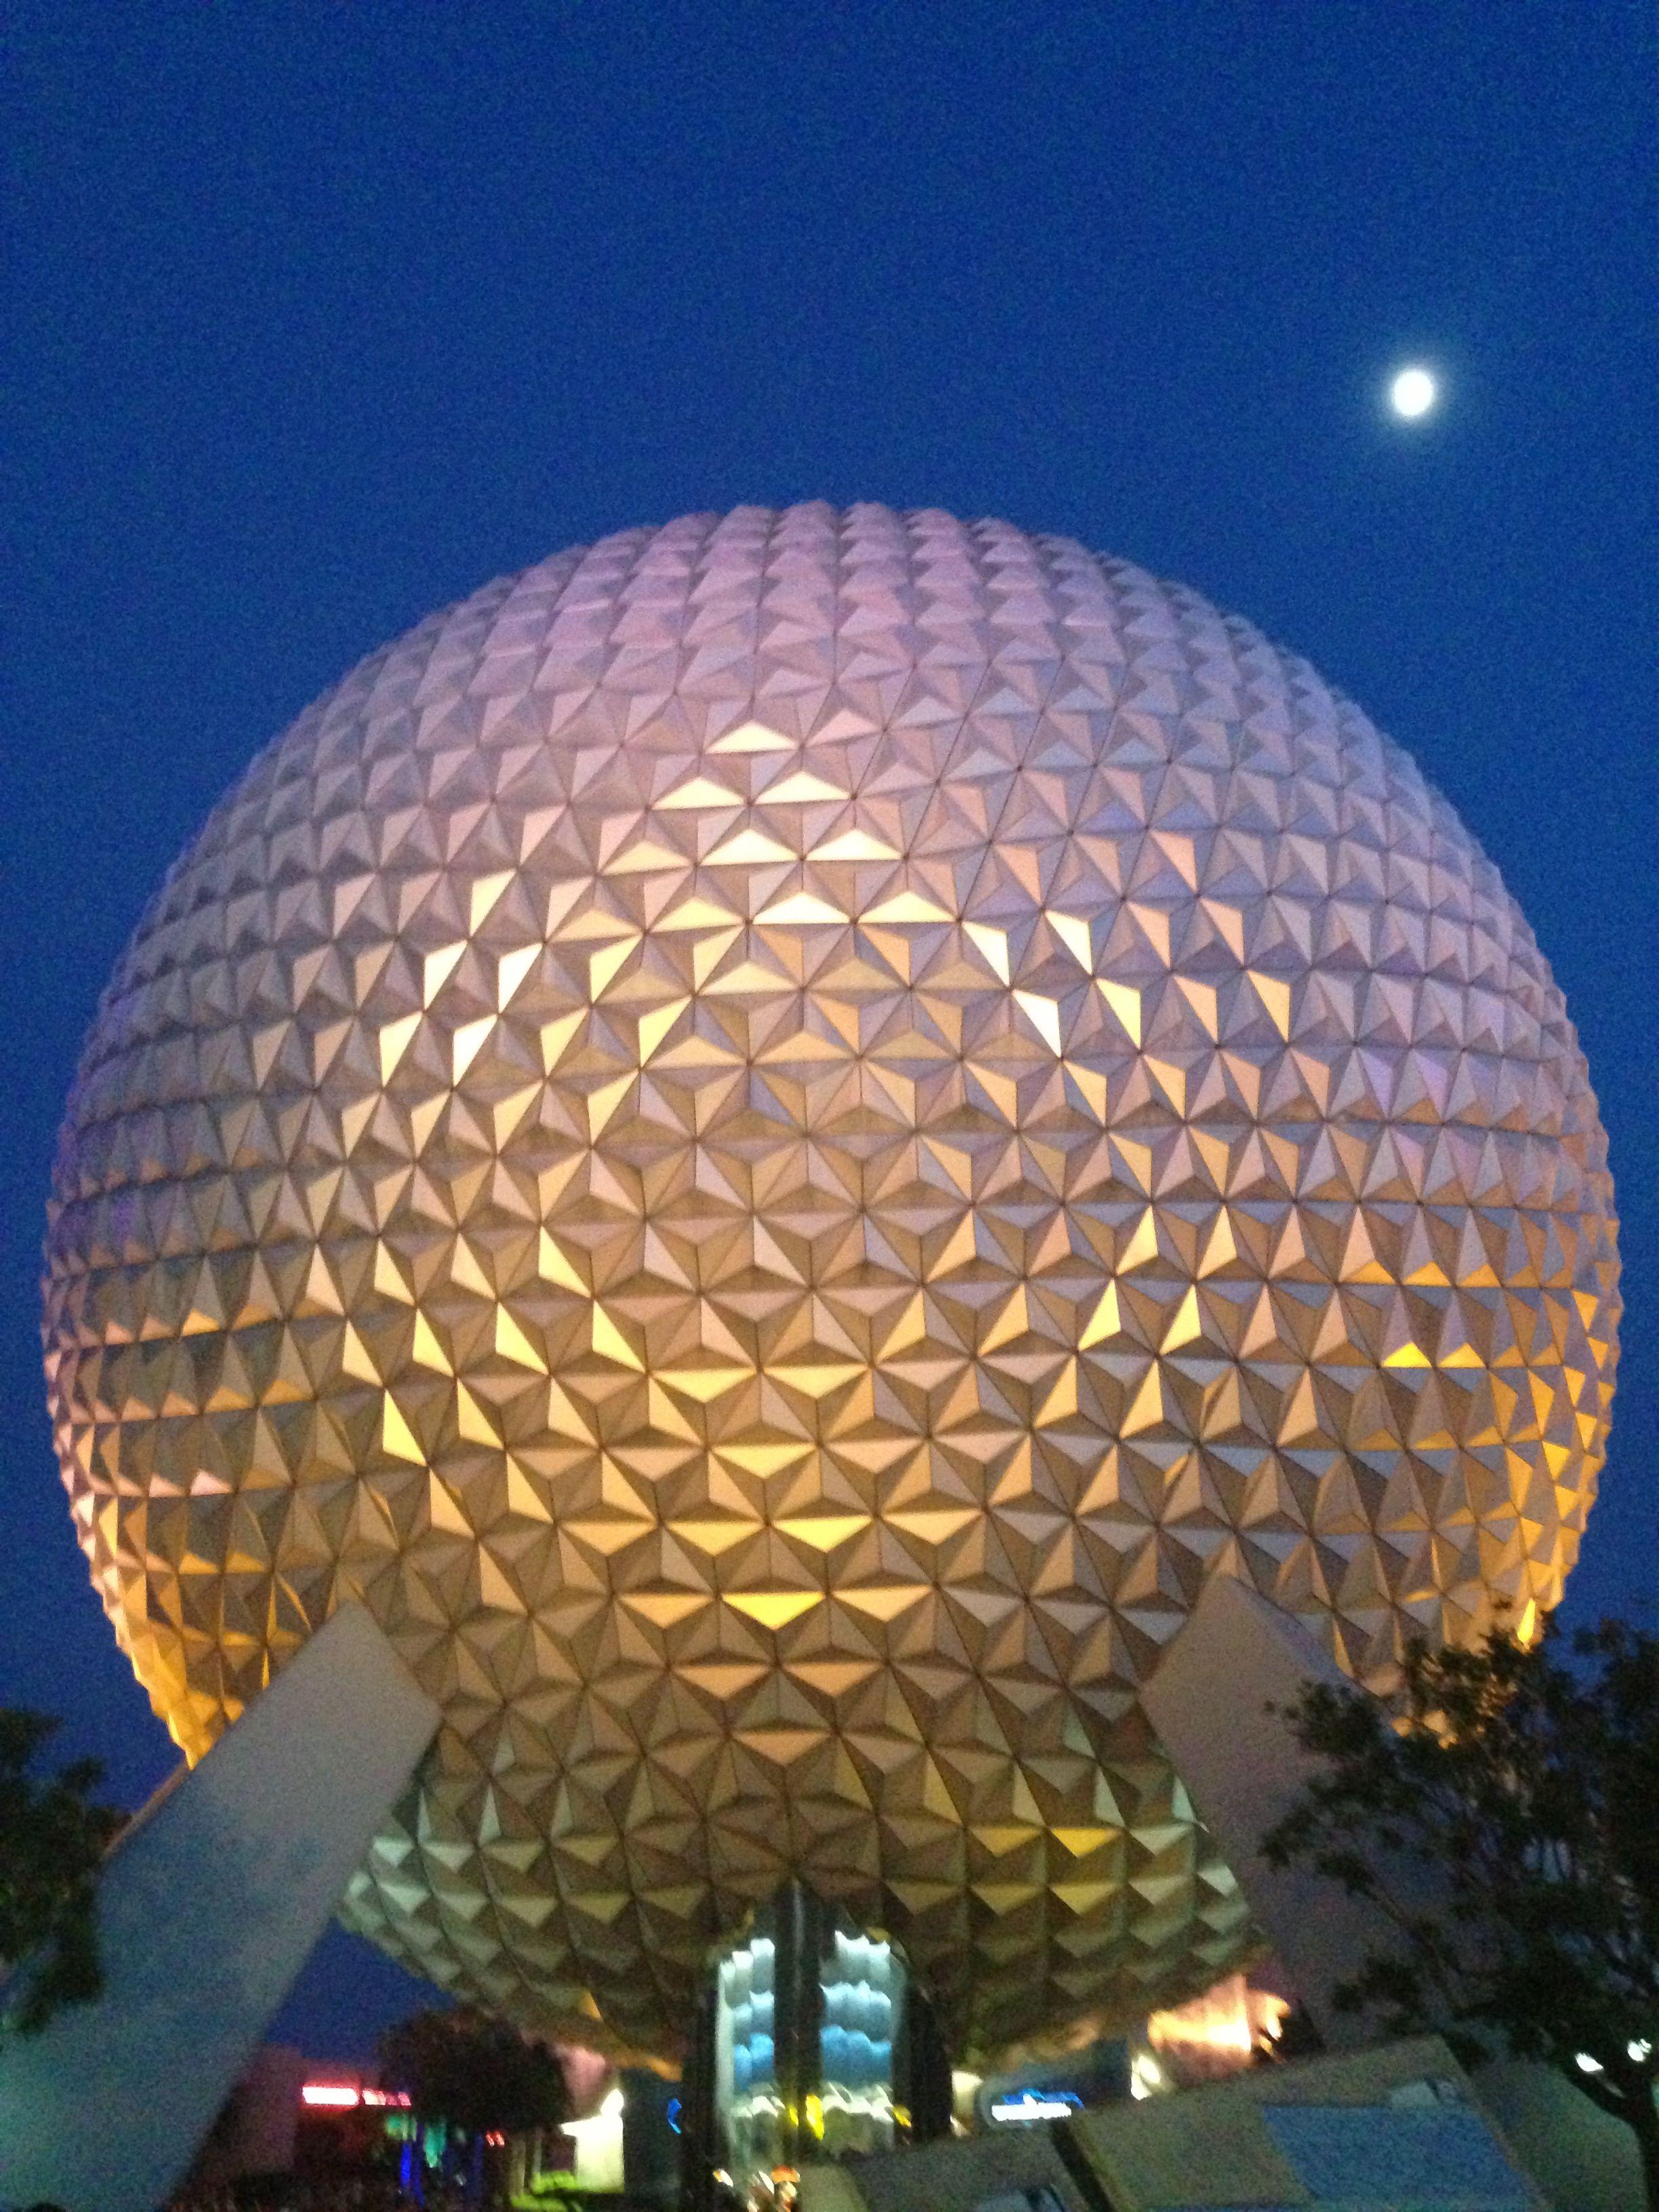 Epcot Orlando Disney Http Www Universal Nissan Com Index Htm Disneyland Florida Disney Orlando Orlando Vacation